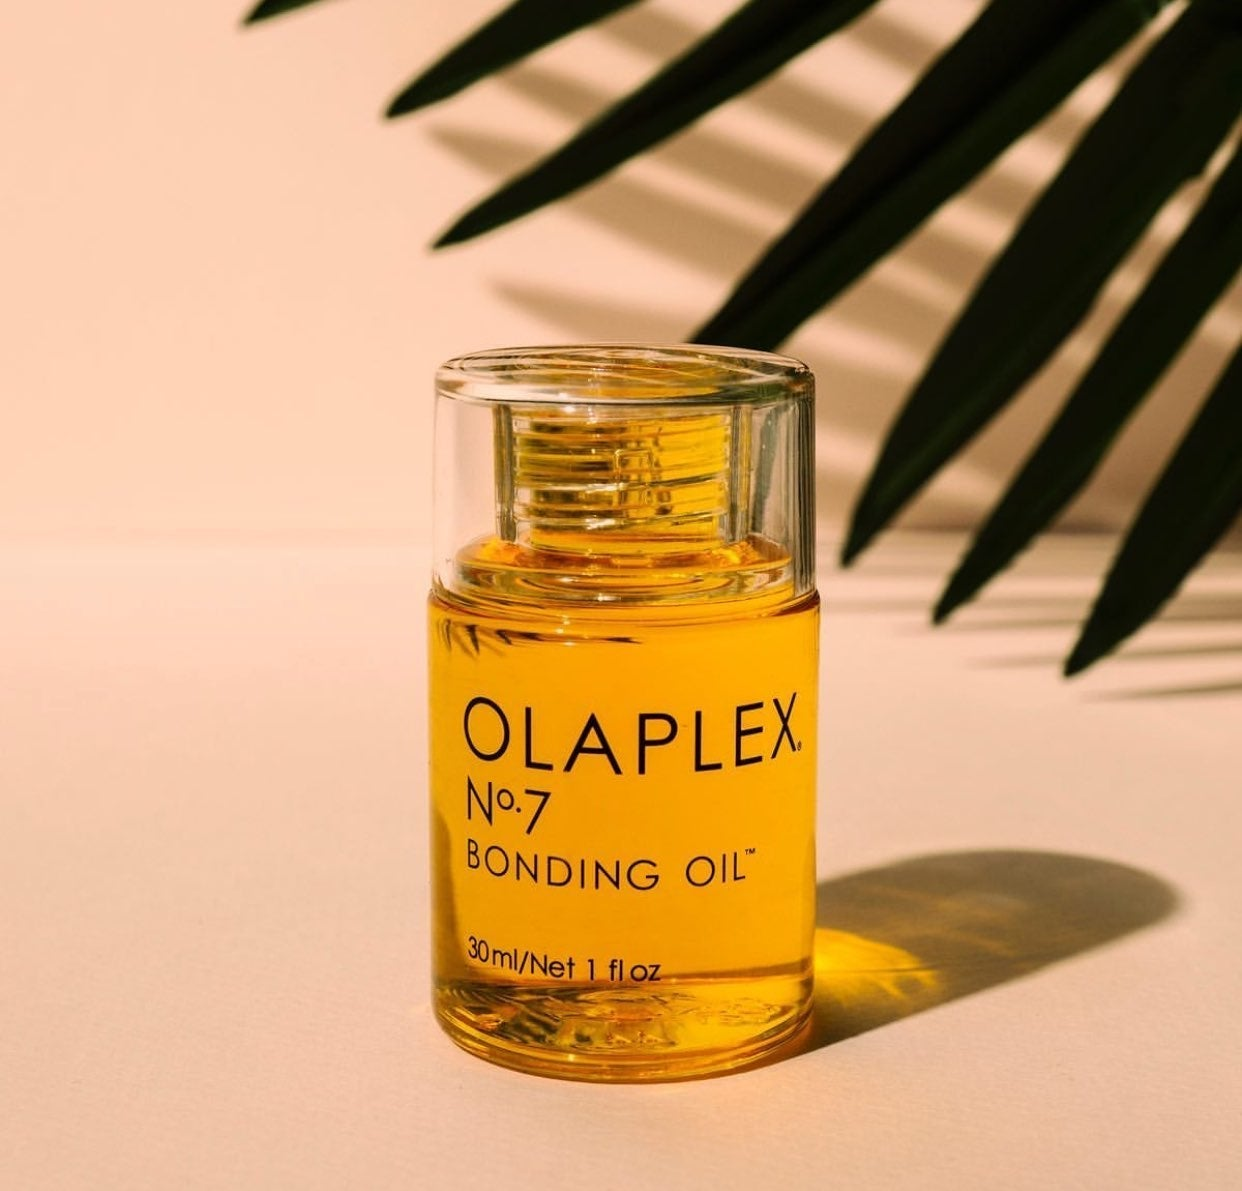 Olaplex N° 7